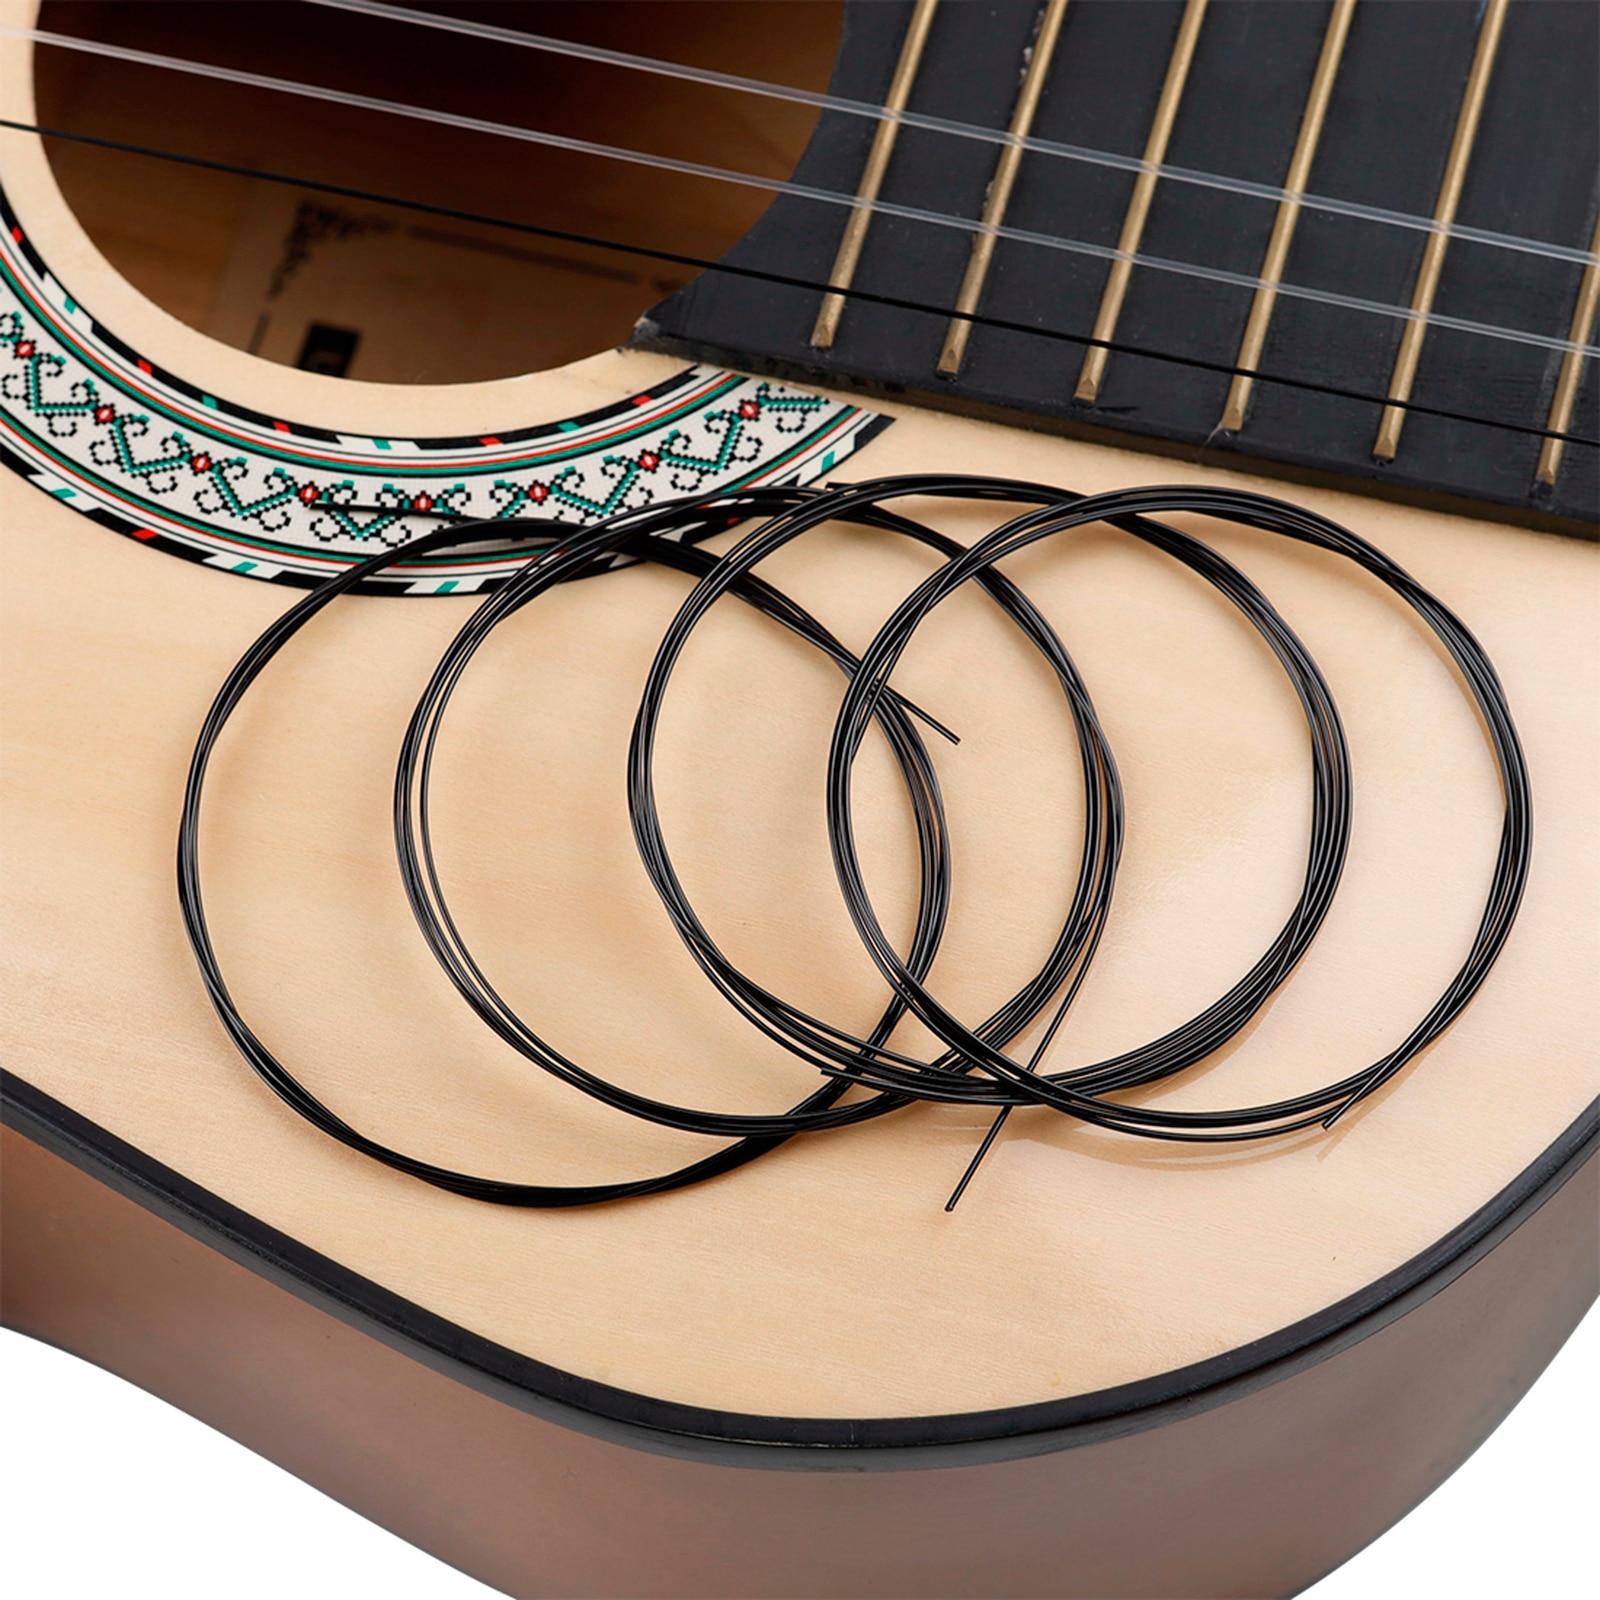 100PCS Guitar Professional Nylon Black String for Classic Guitar E-1 DIY enlarge